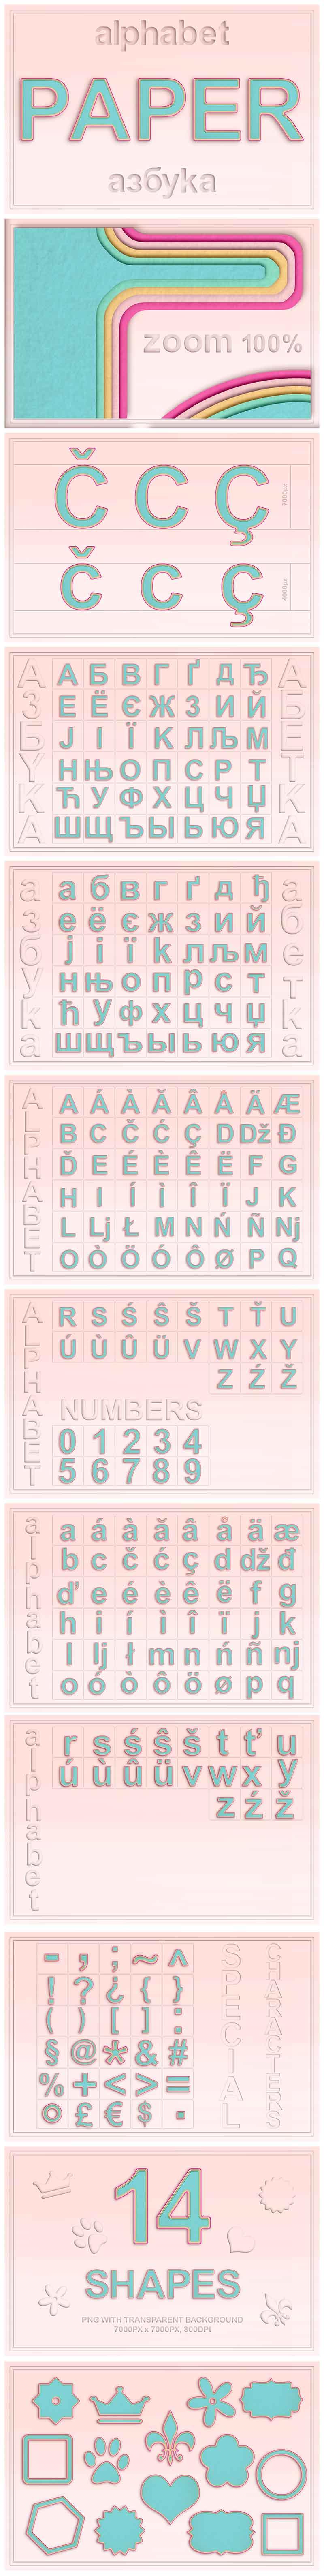 Huge Graphic Bundle Alphabet with 1000+ elements - $25 - Paper min